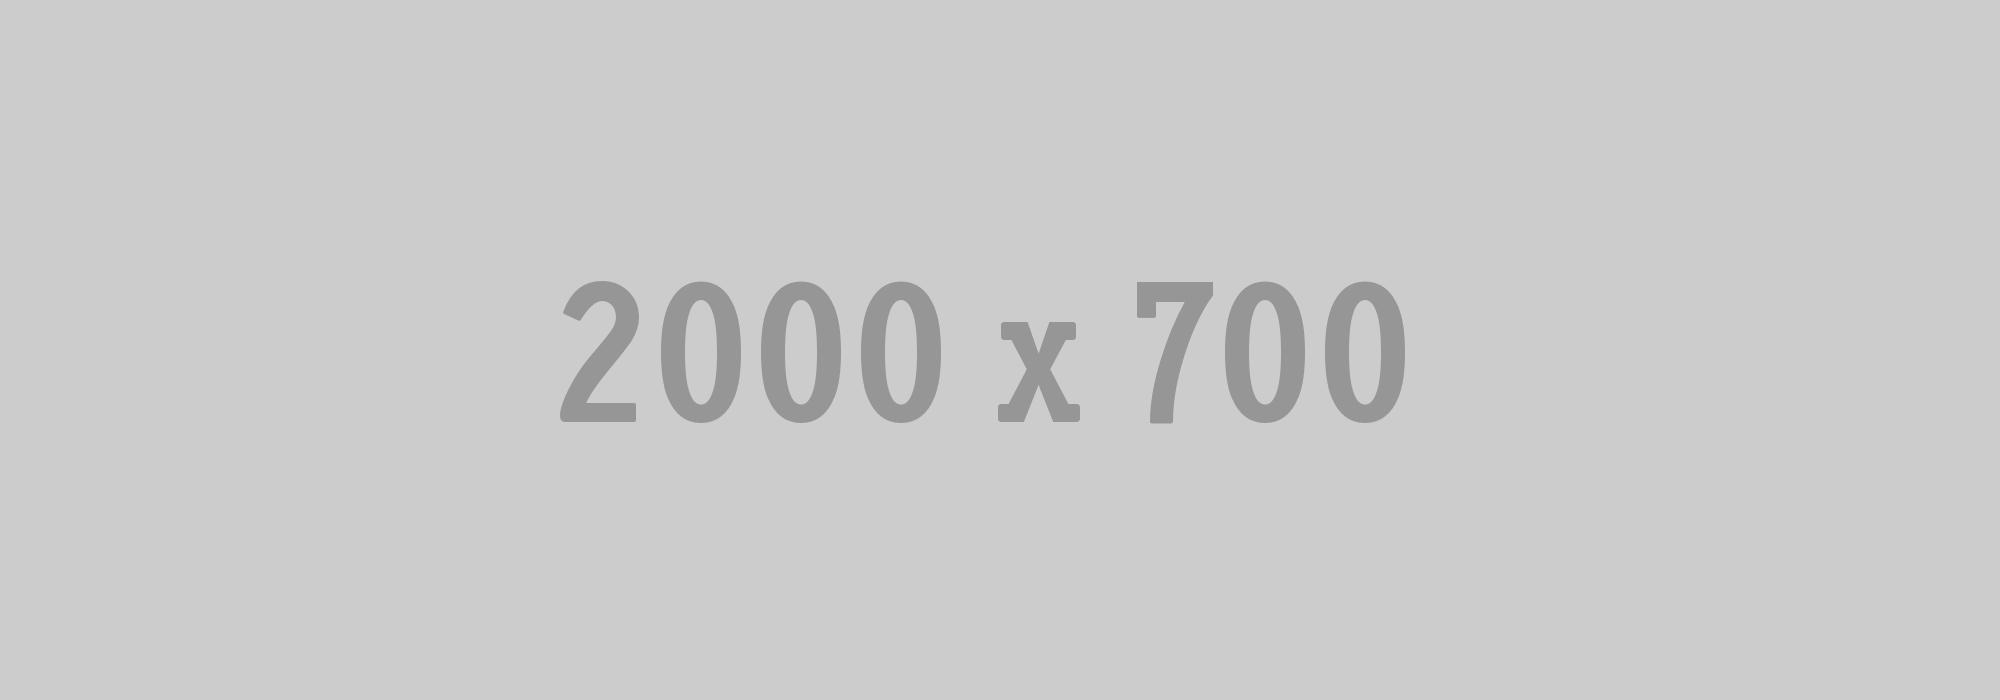 2000x700.jpg